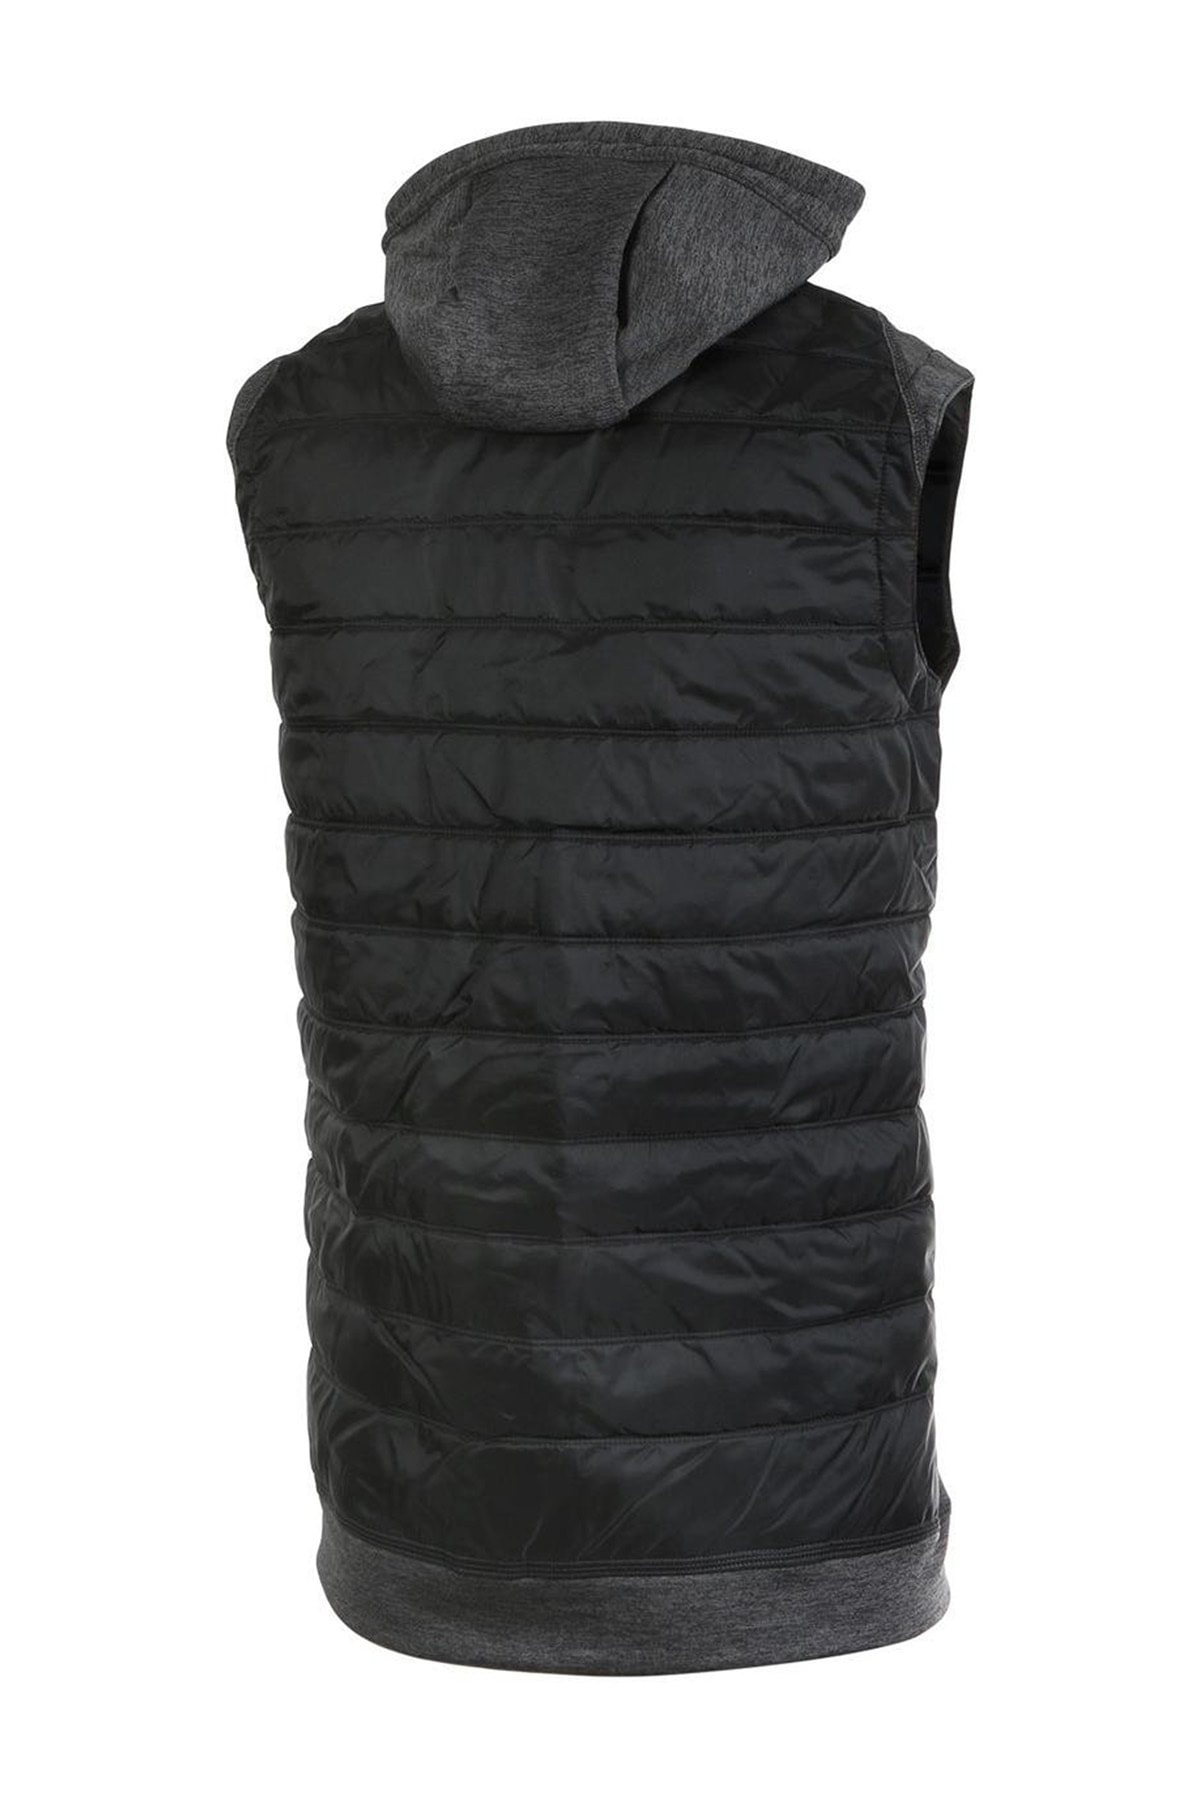 Nike Thermal FZ Vest Winterized Erkek Yelek 1